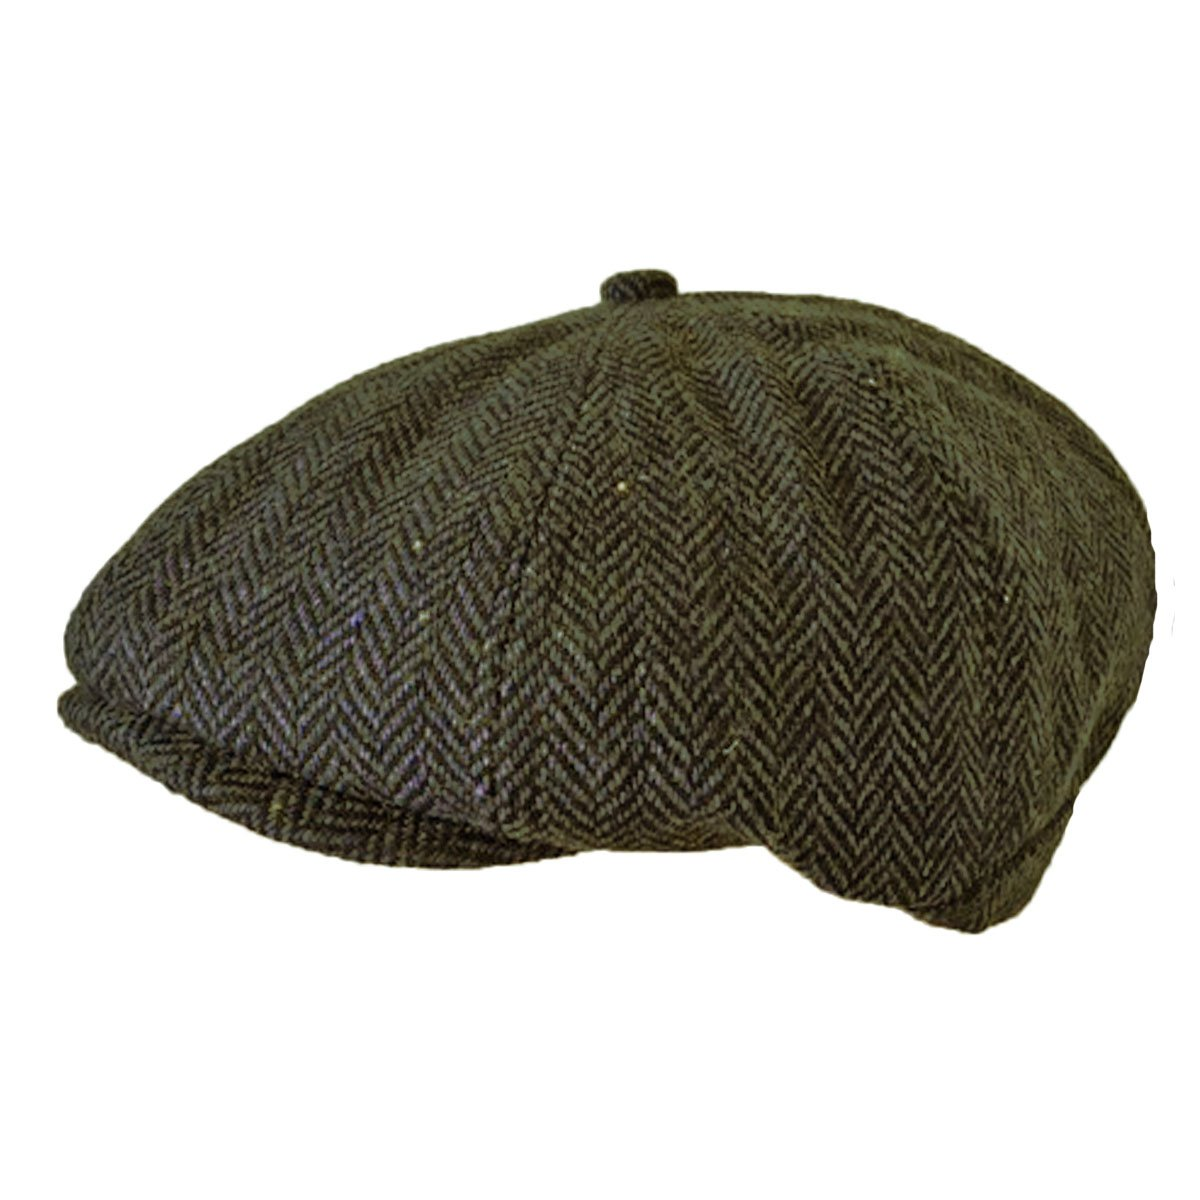 TOSKATOK® Unisex Mens, Ladies 8 Panel Herringbone Wool Blend Baker Boy News Boy Cap